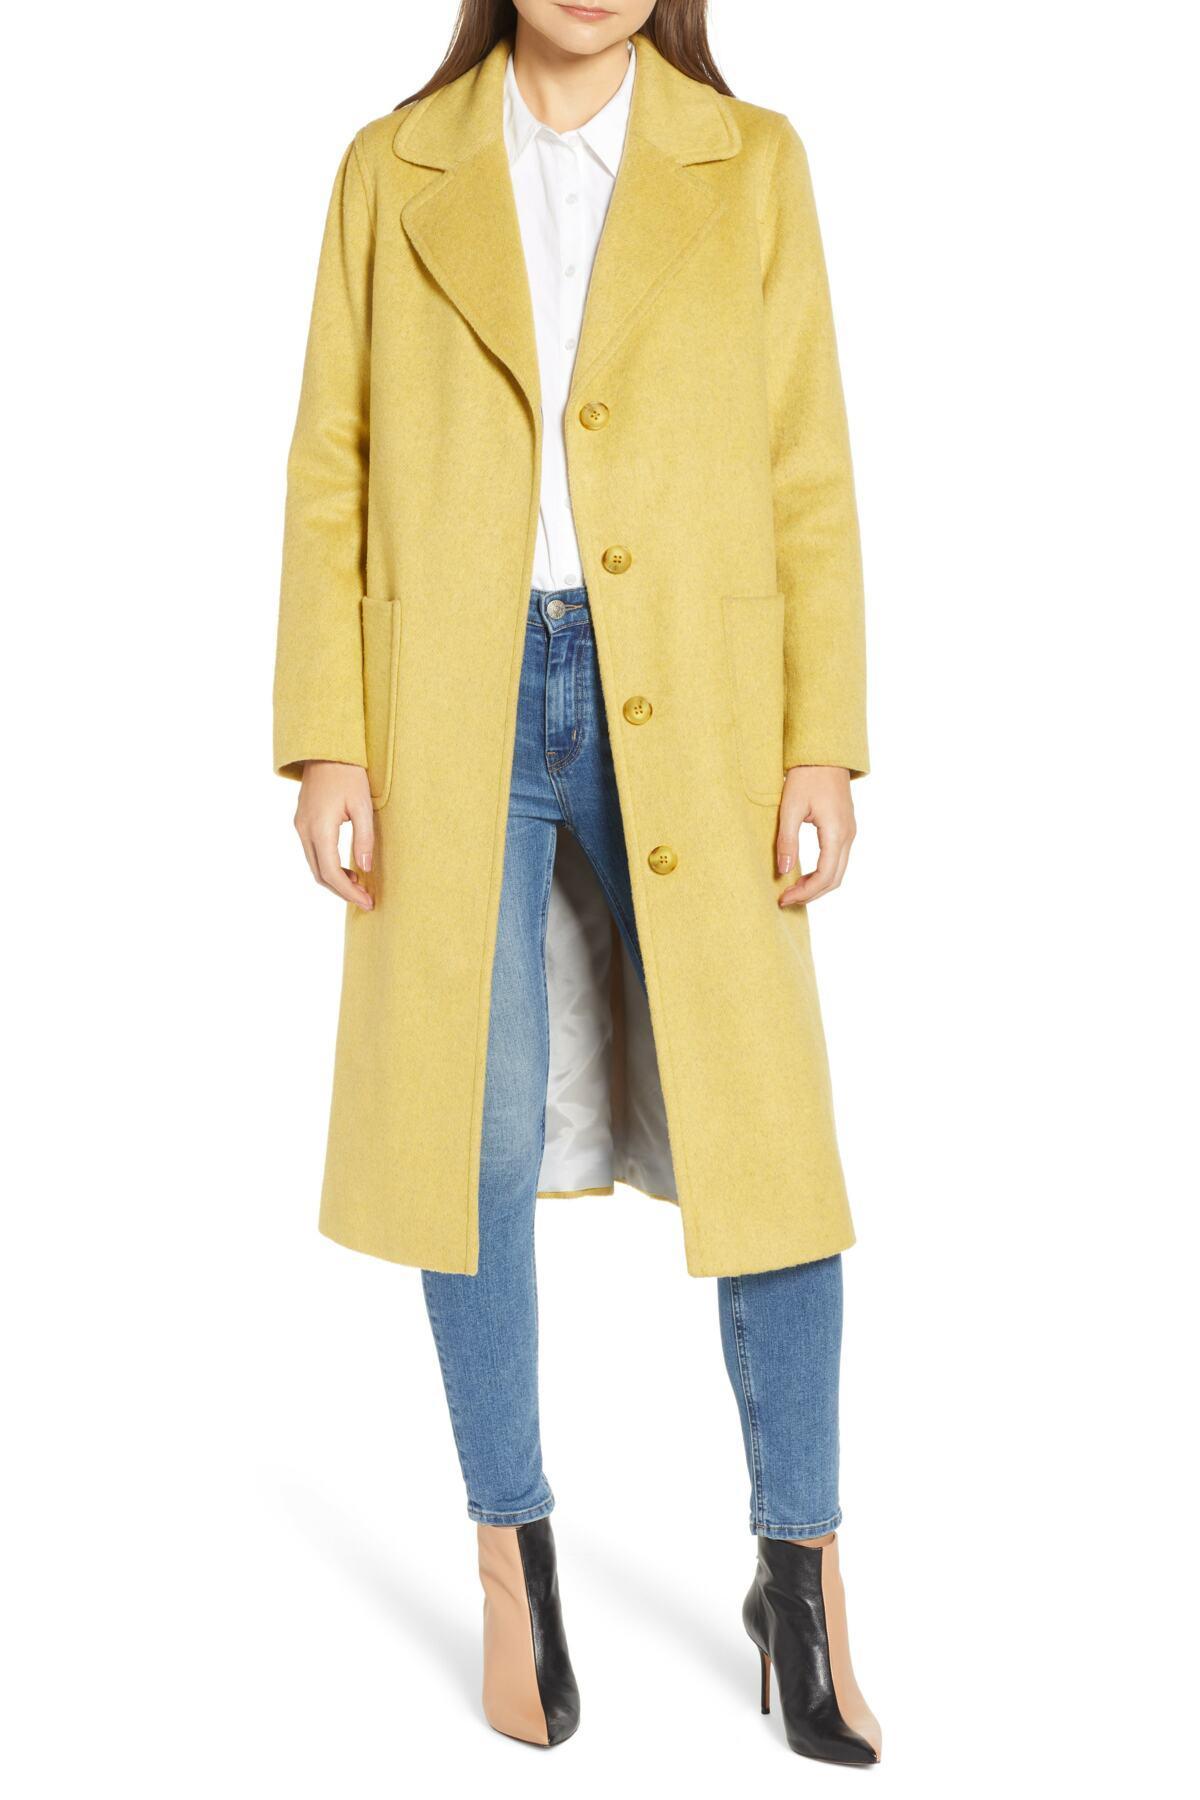 345a3c4bb563 Helene Berman Ruth Knee Length Coat in Yellow - Lyst